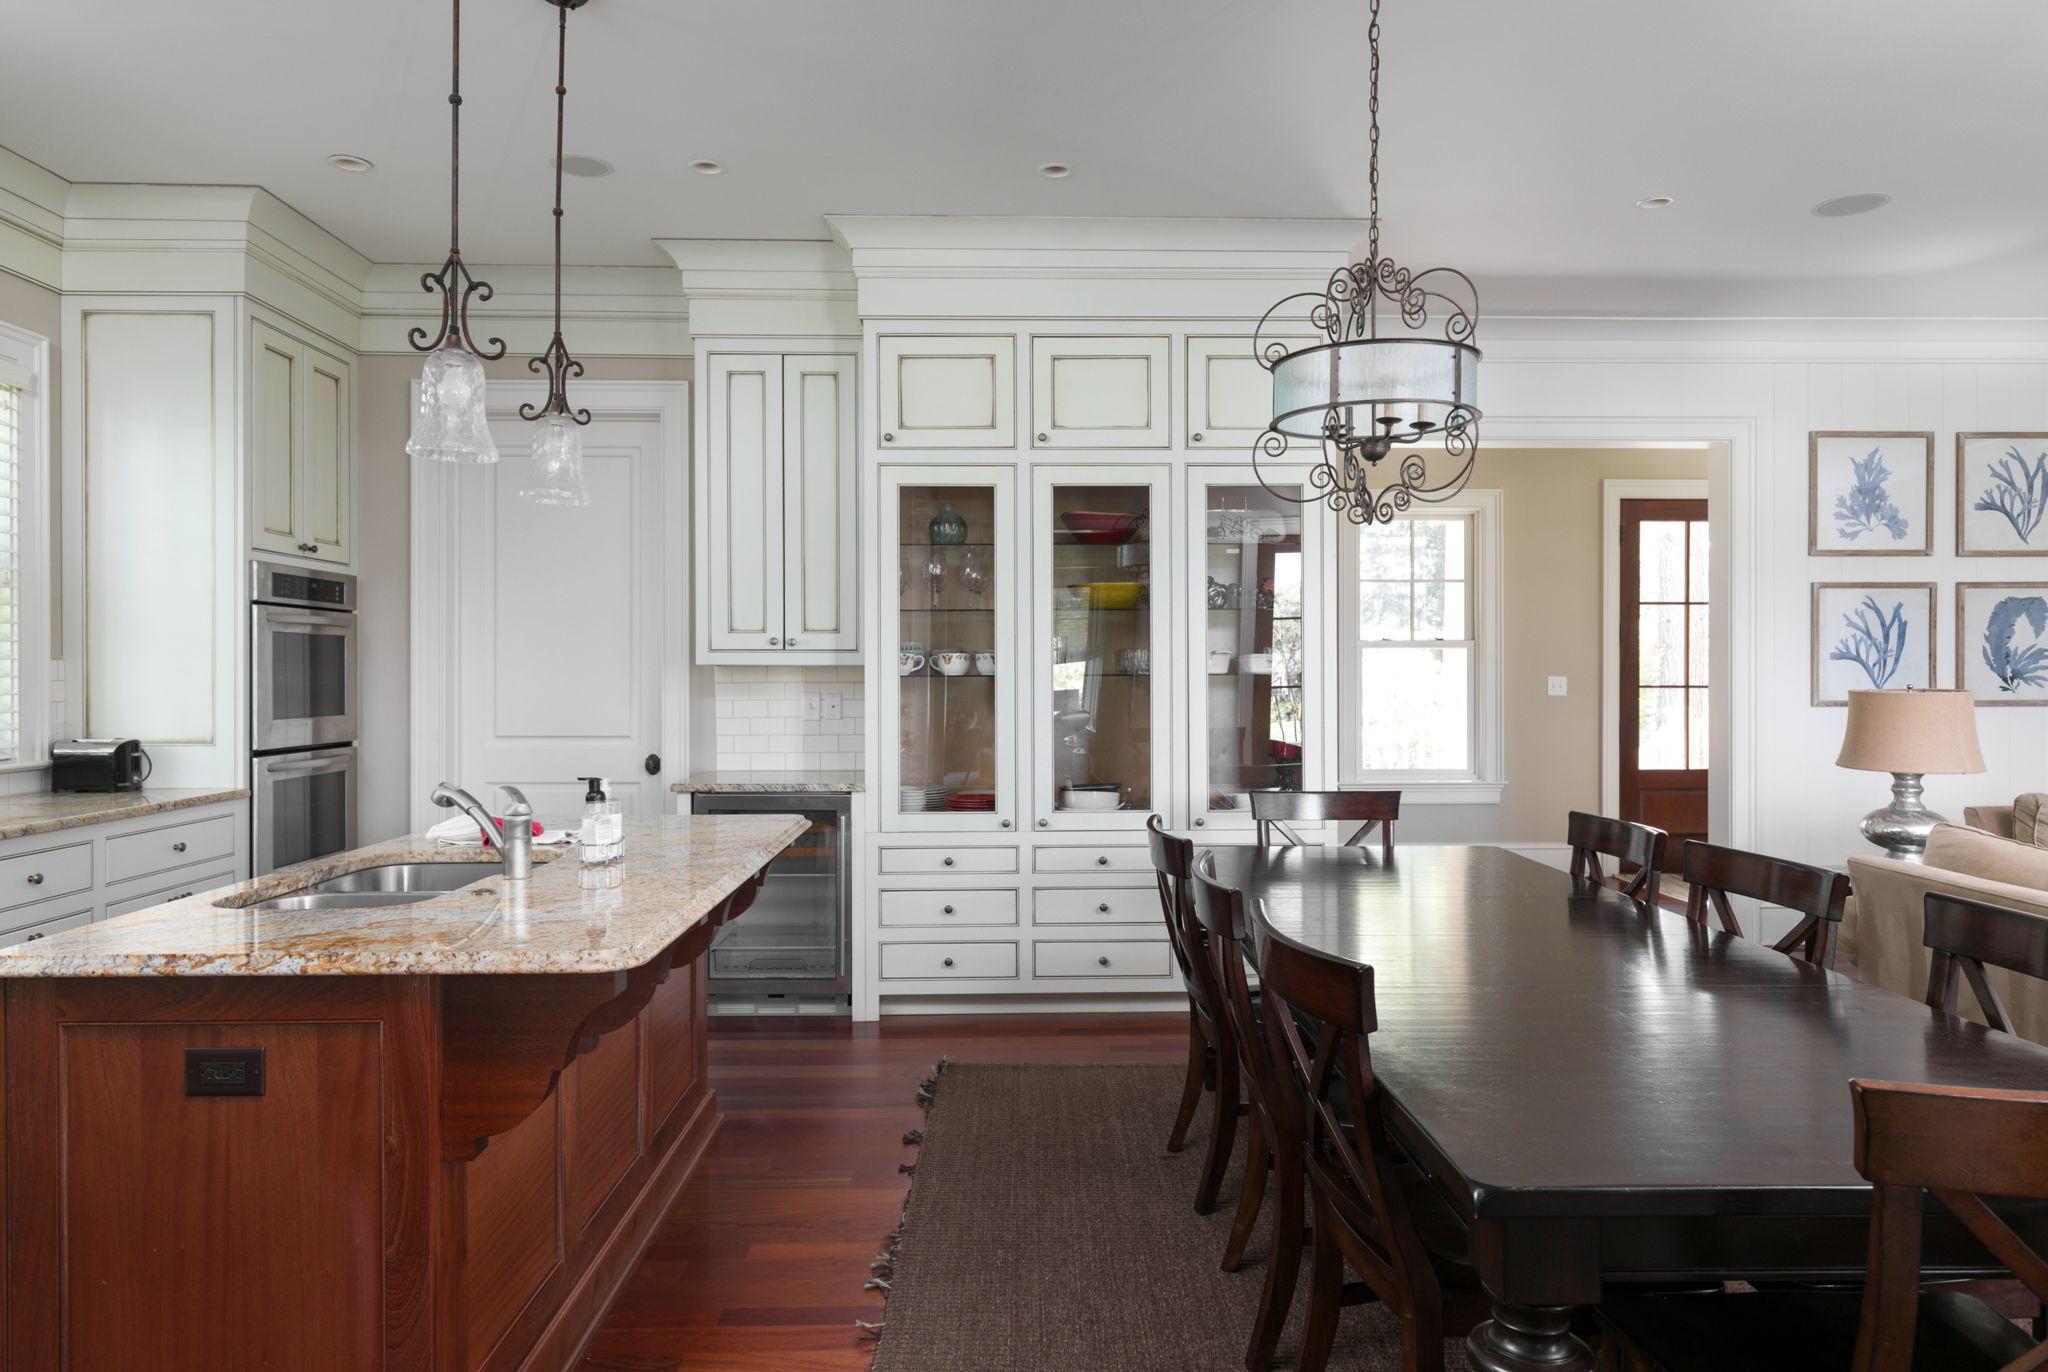 Egret/Pintail Homes For Sale - 117 Bufflehead, Kiawah Island, SC - 39